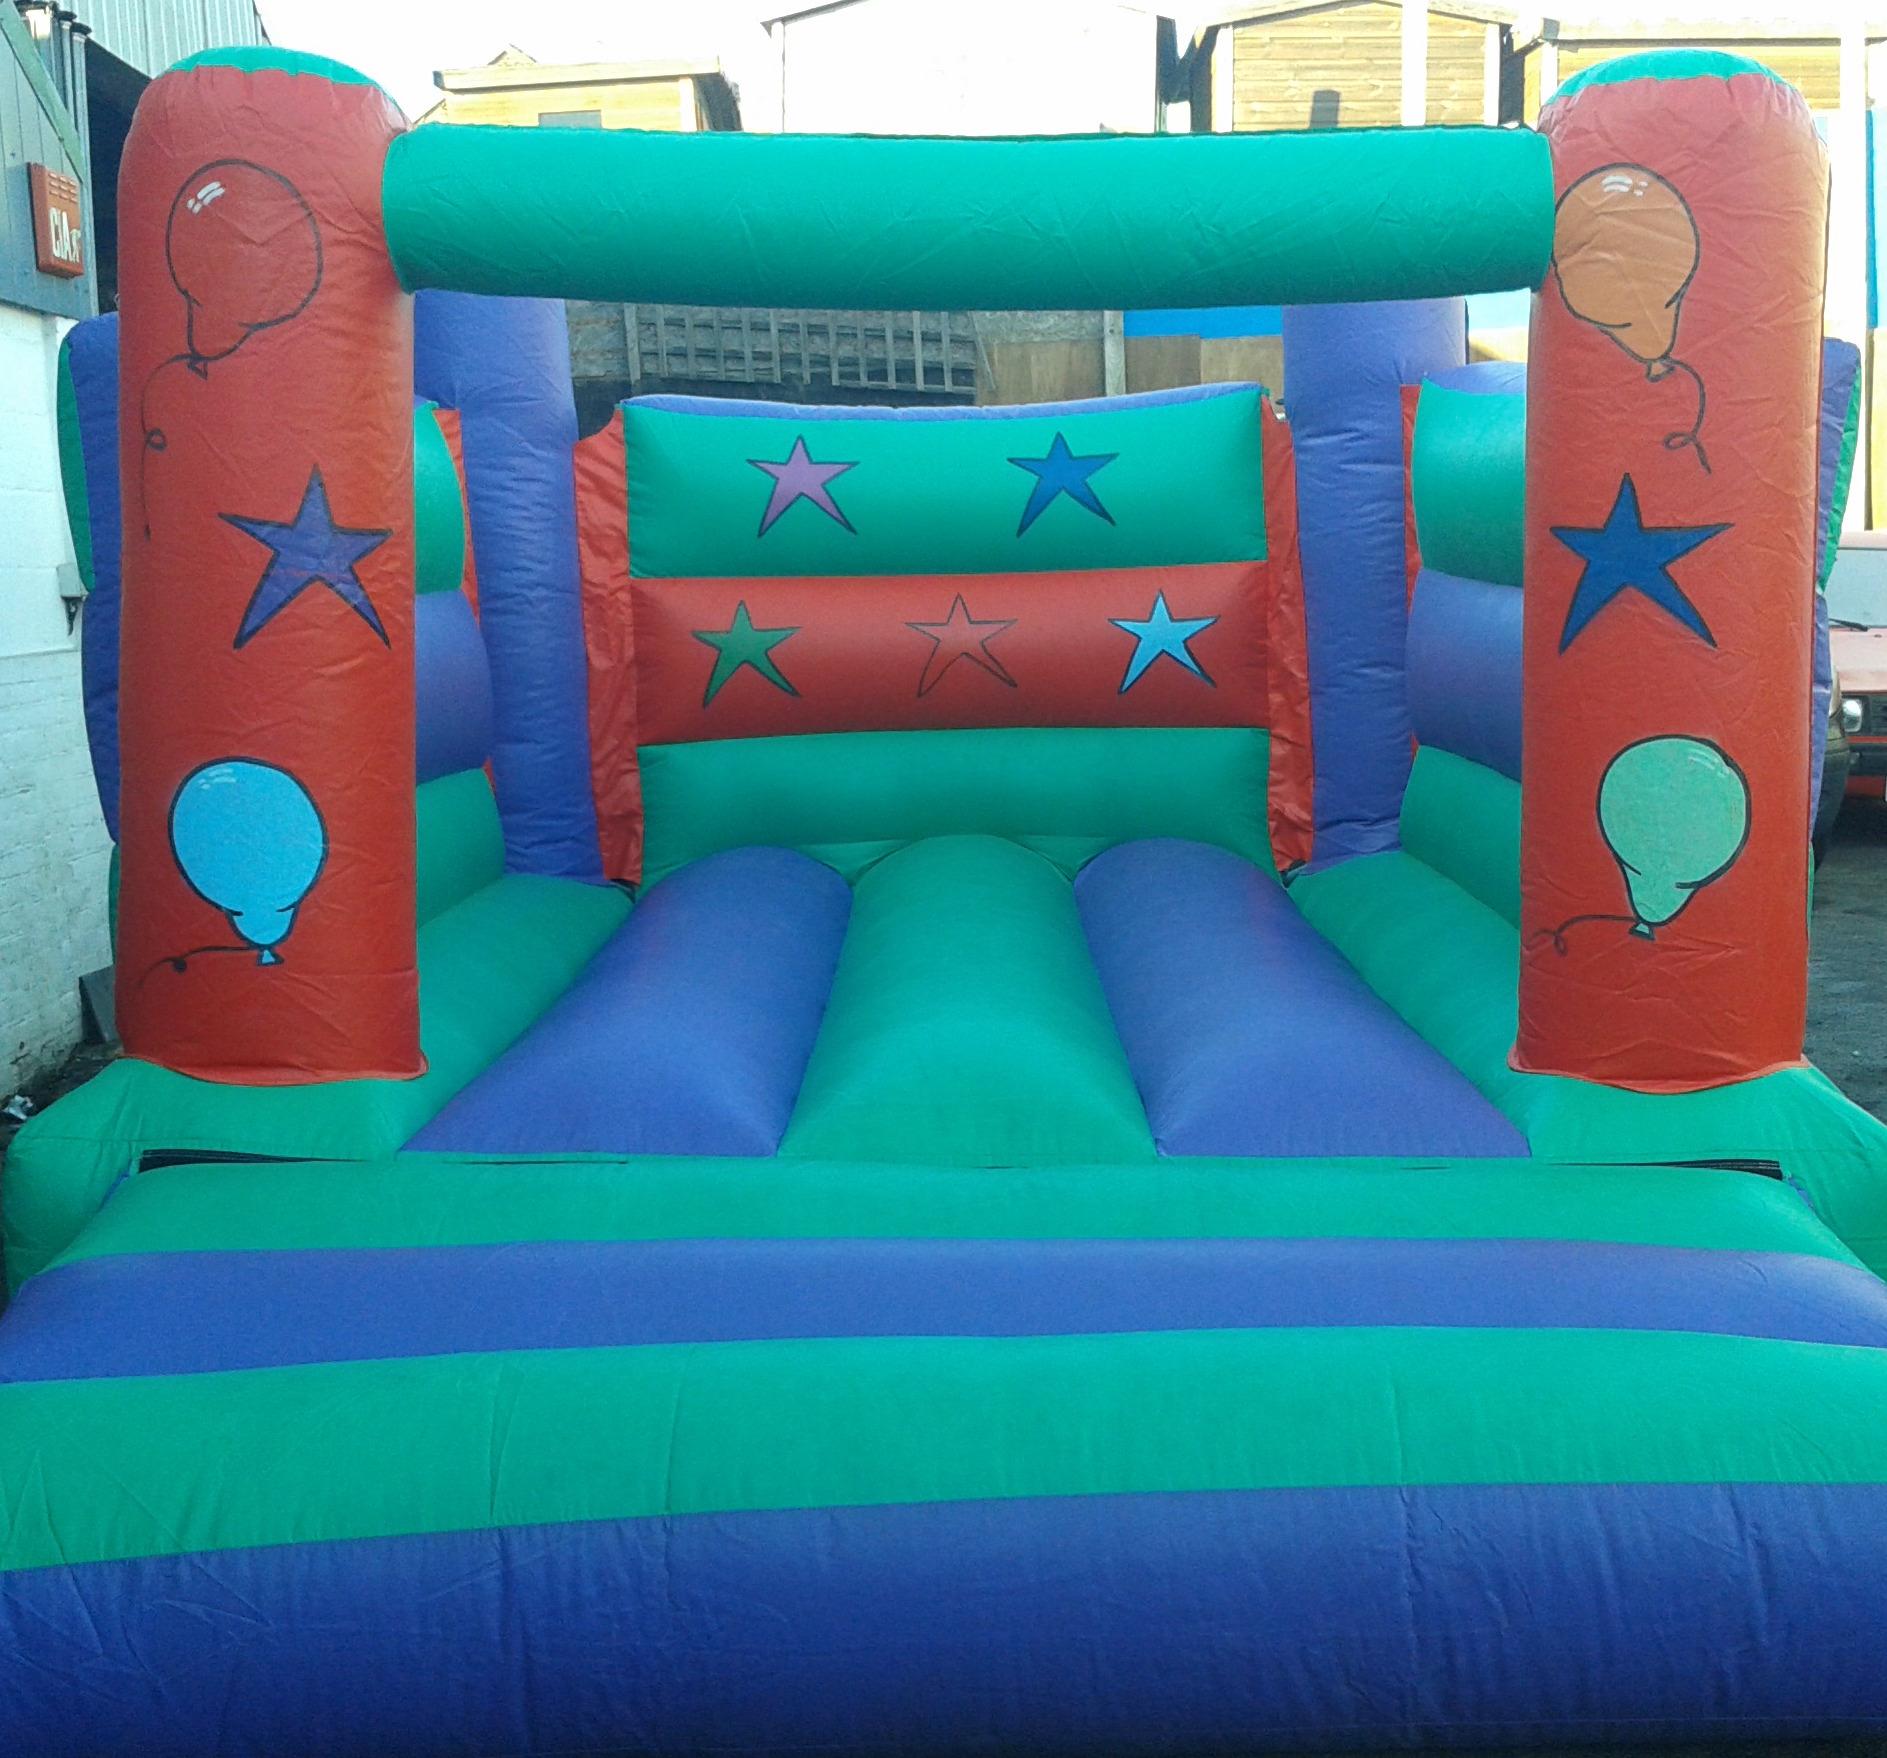 Low Ceiling Bouncy Castle 10x15ft